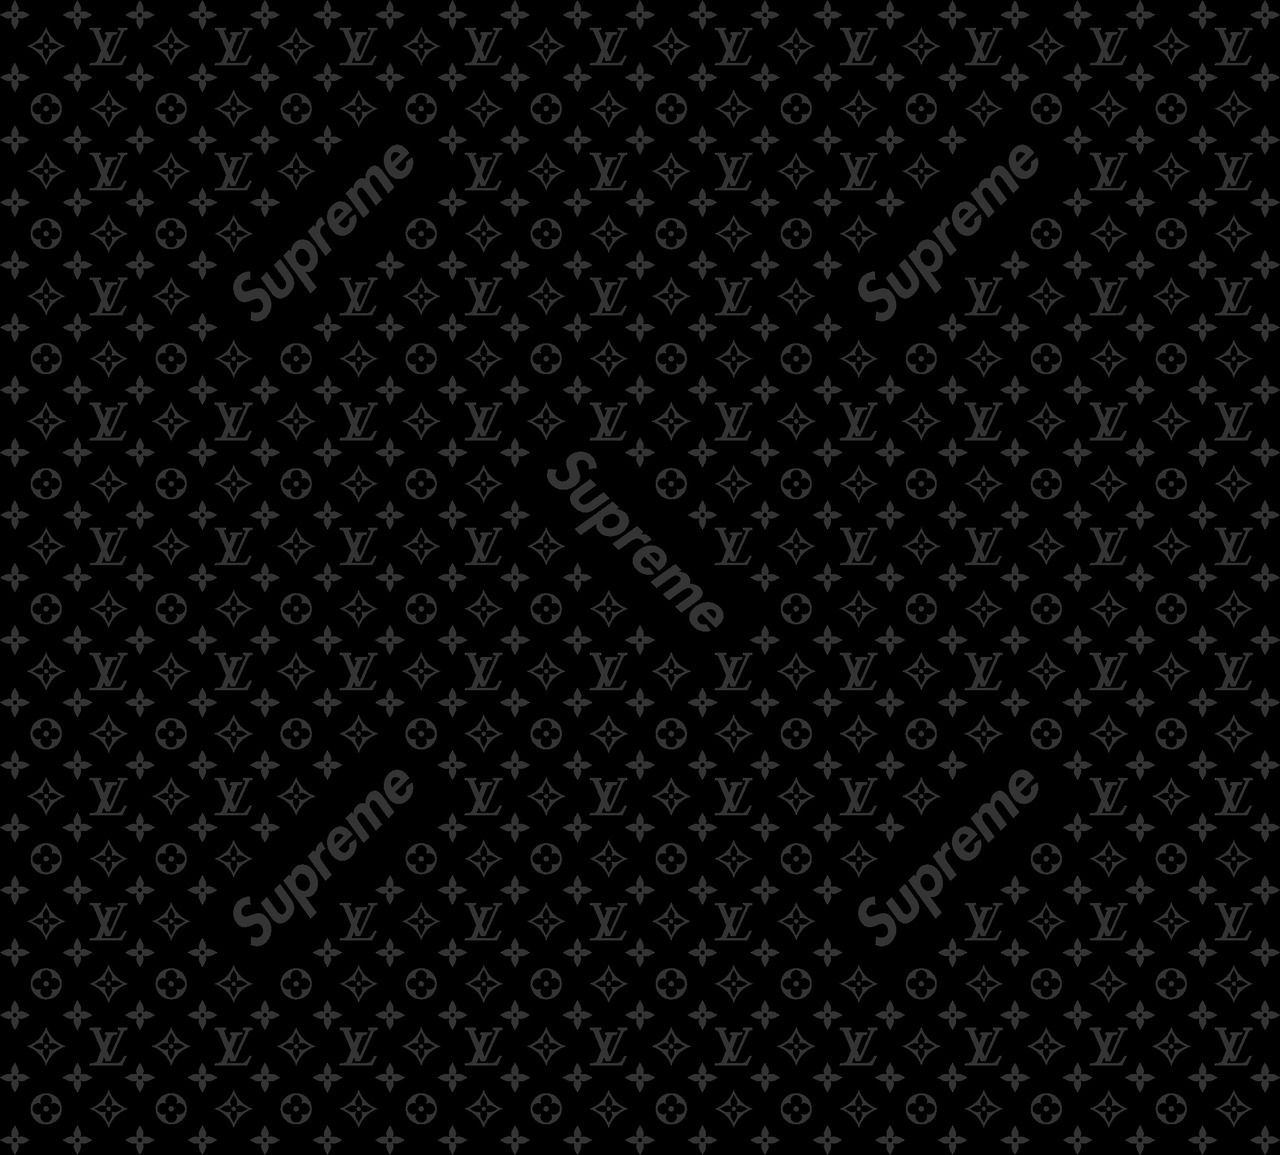 Black Supreme Wallpapers Top Free Black Supreme